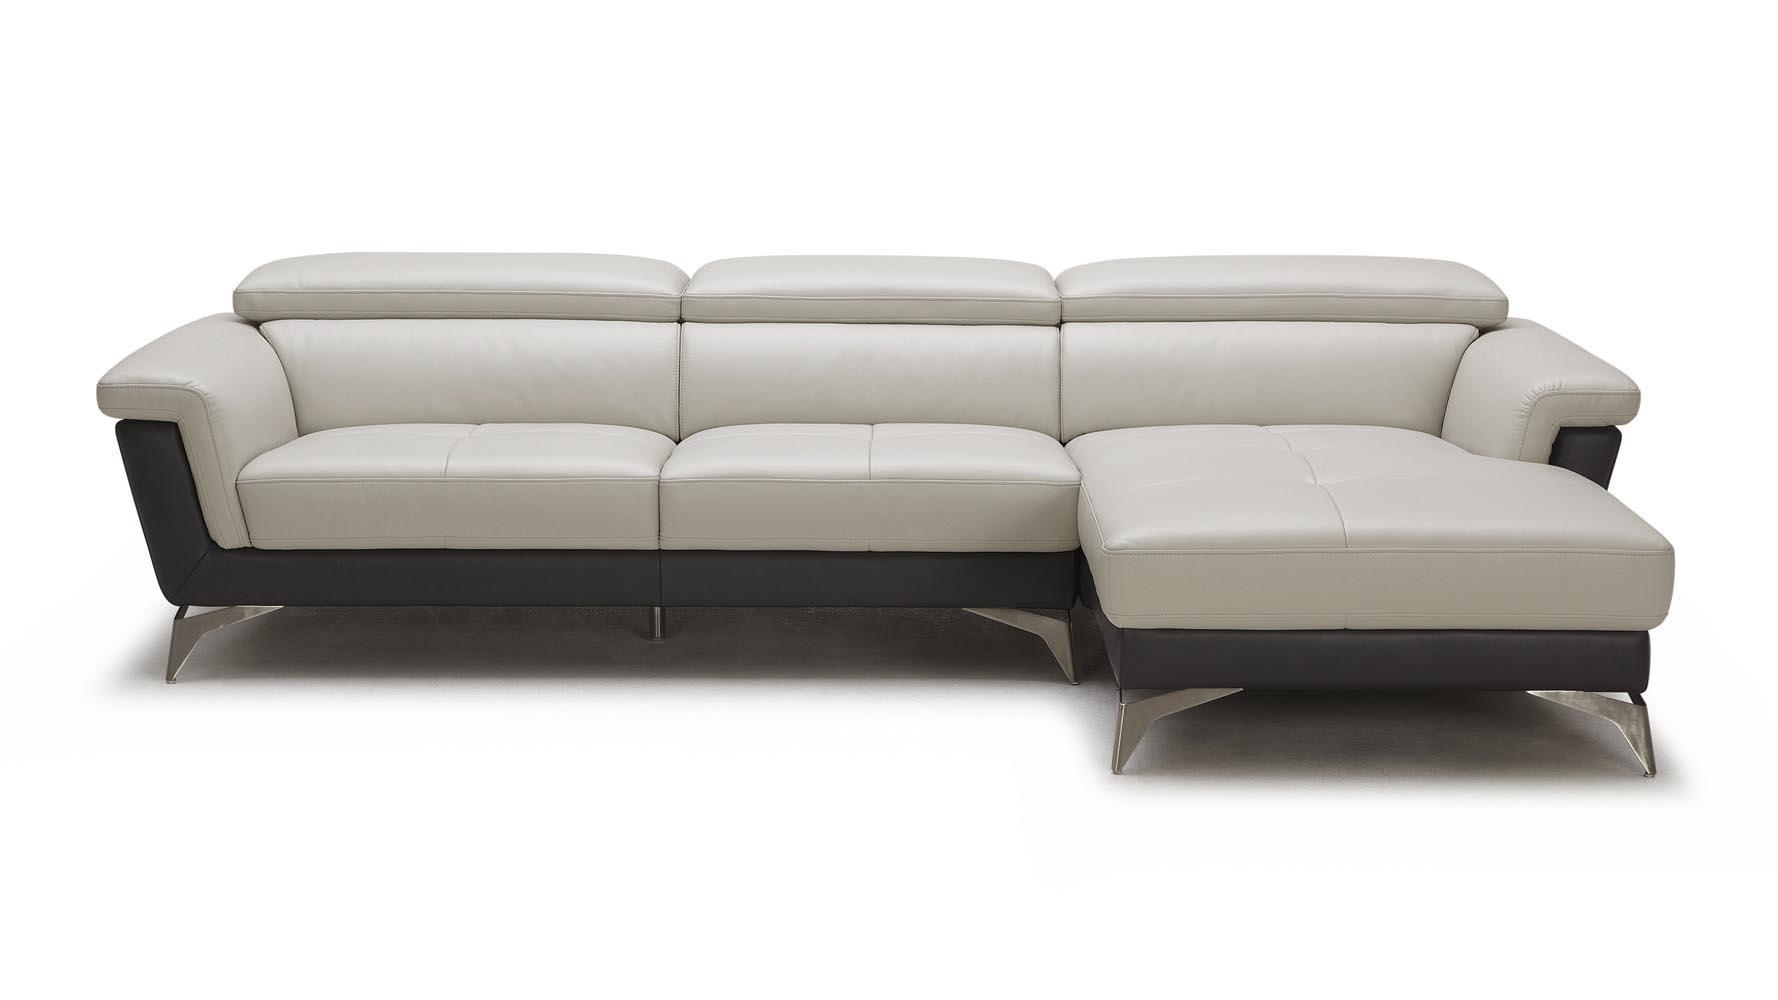 Gray/black Savoy 3 Seater Sectional Sofa | Zuri Furniture Within Savoy Sofas (Image 4 of 20)